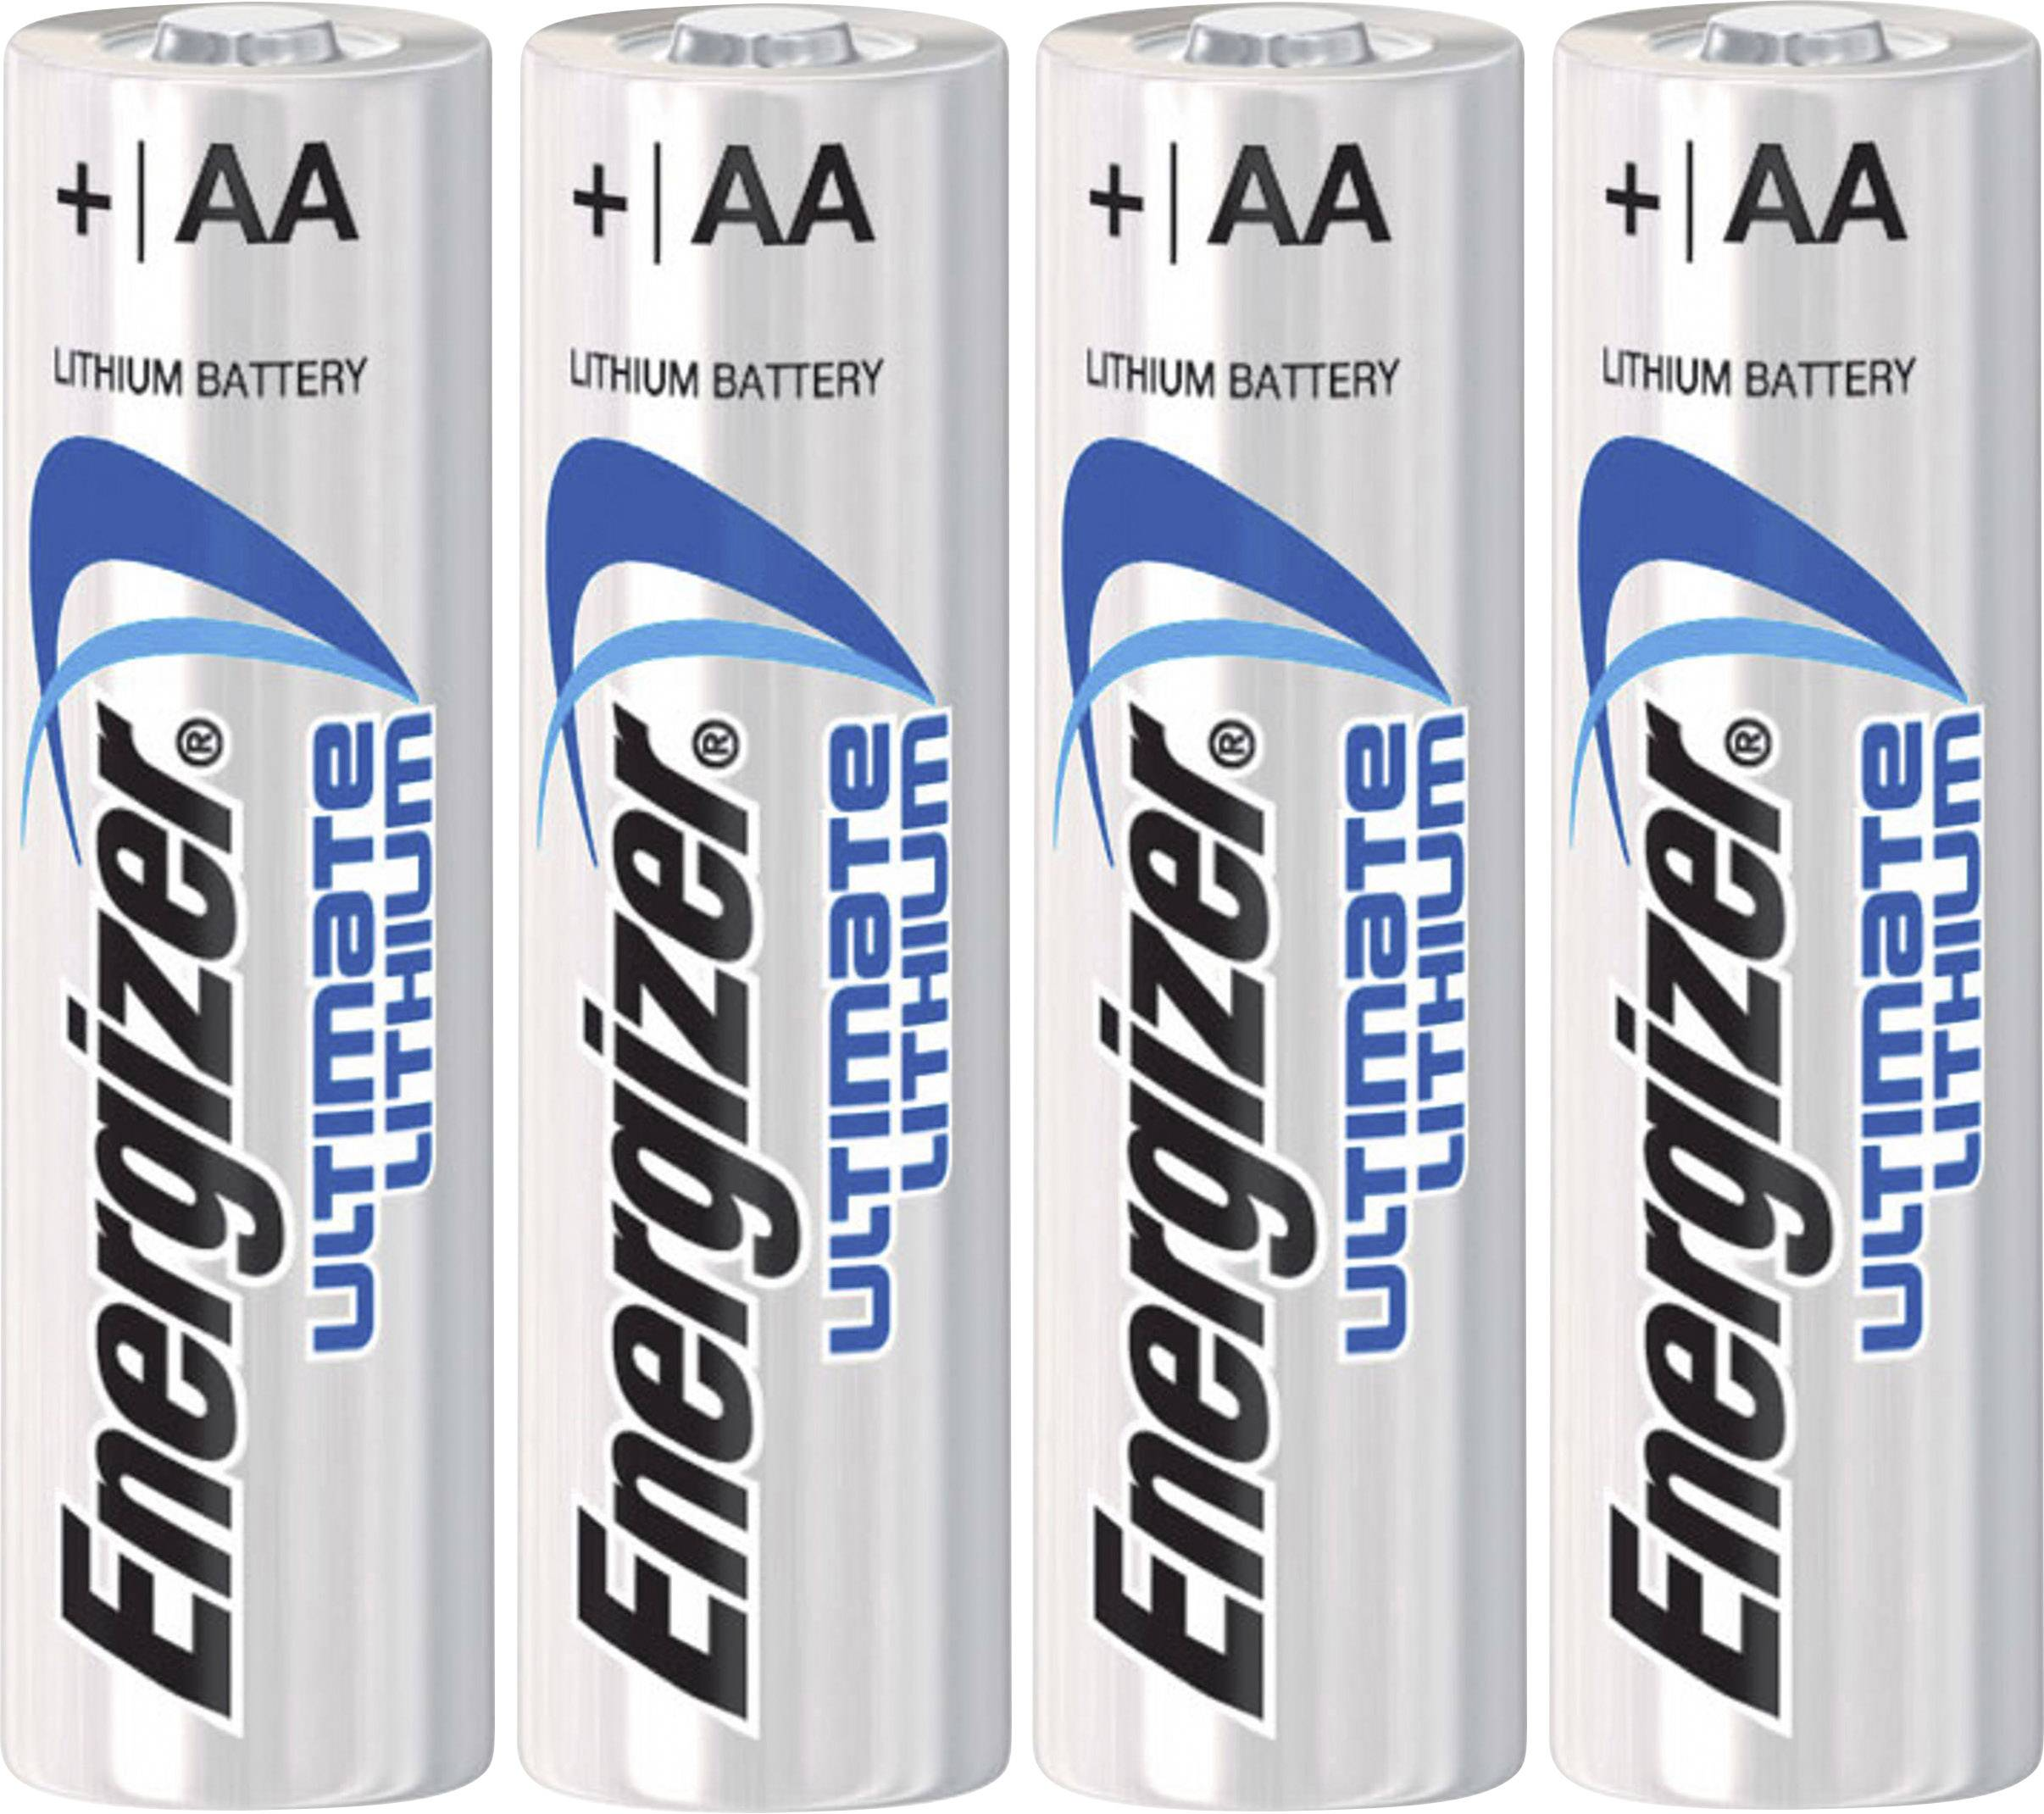 Tužková baterie AA Energizer Ultimate FR6, 3000 mAh, 1.5 V, 2 ks